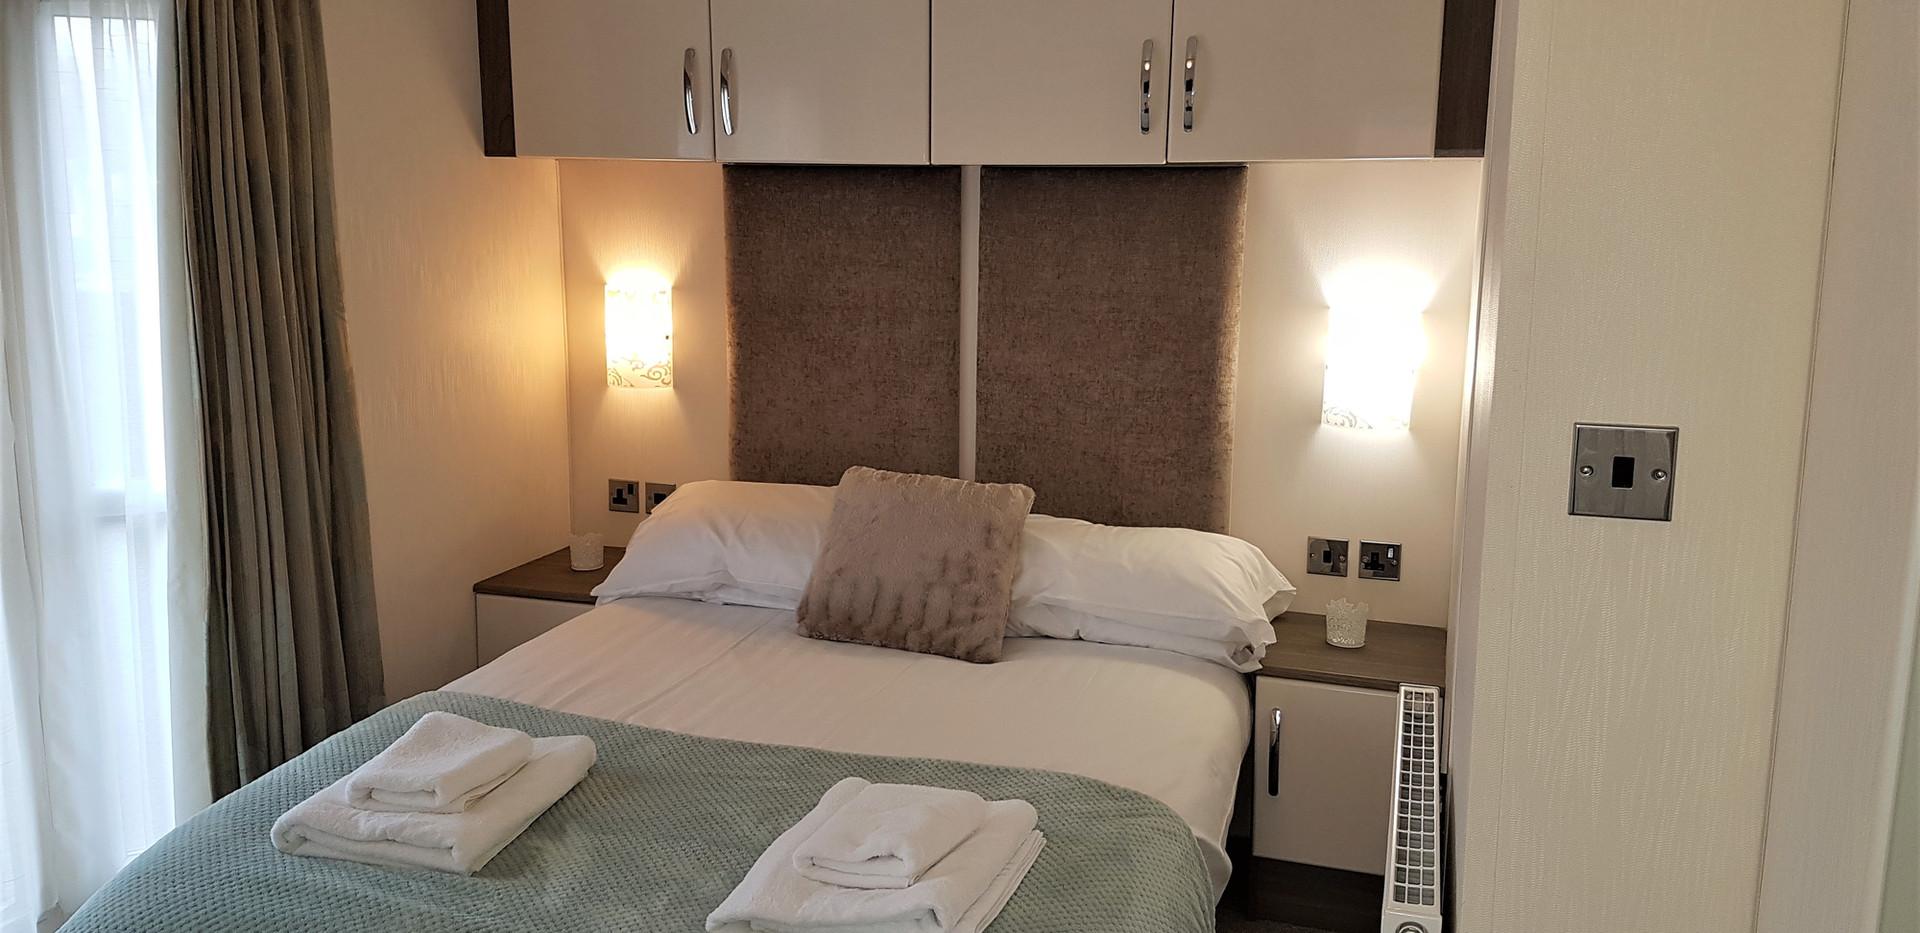 Patricias master bedroom 3.jpg